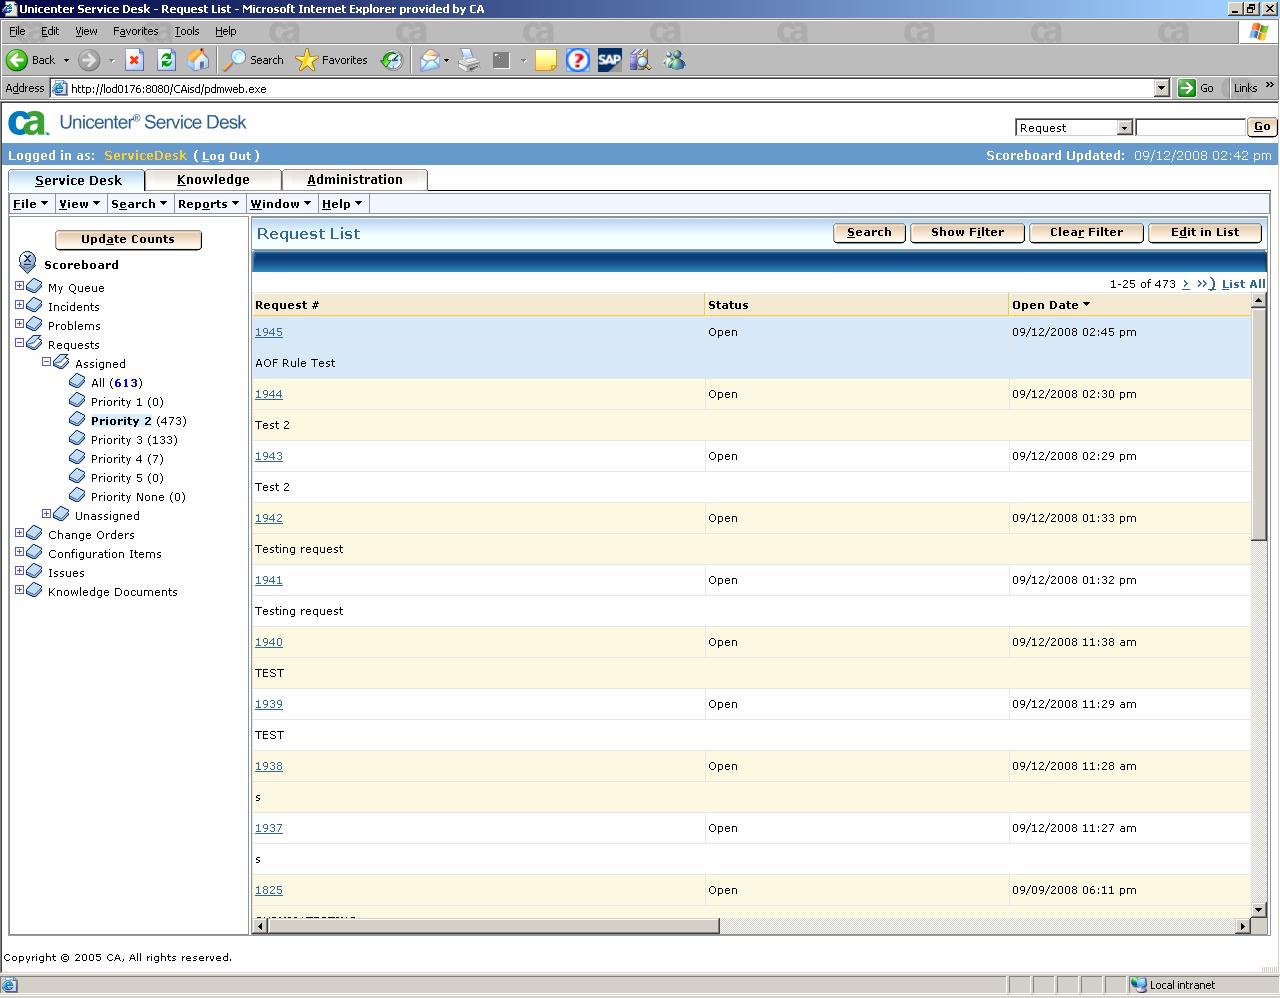 ADDRESS SERVDESK -- Create Service Desk Requests